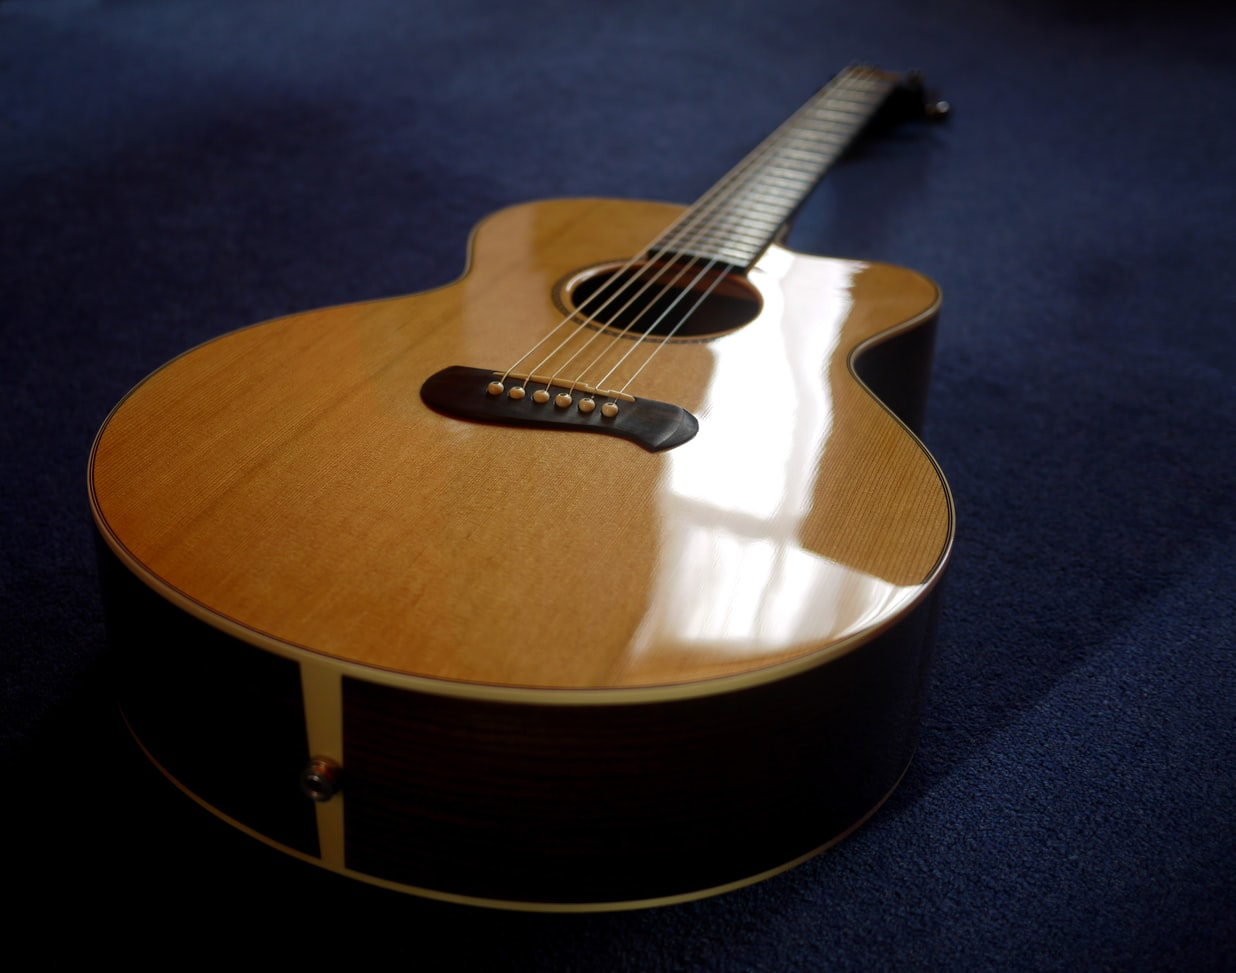 polishing your guitar